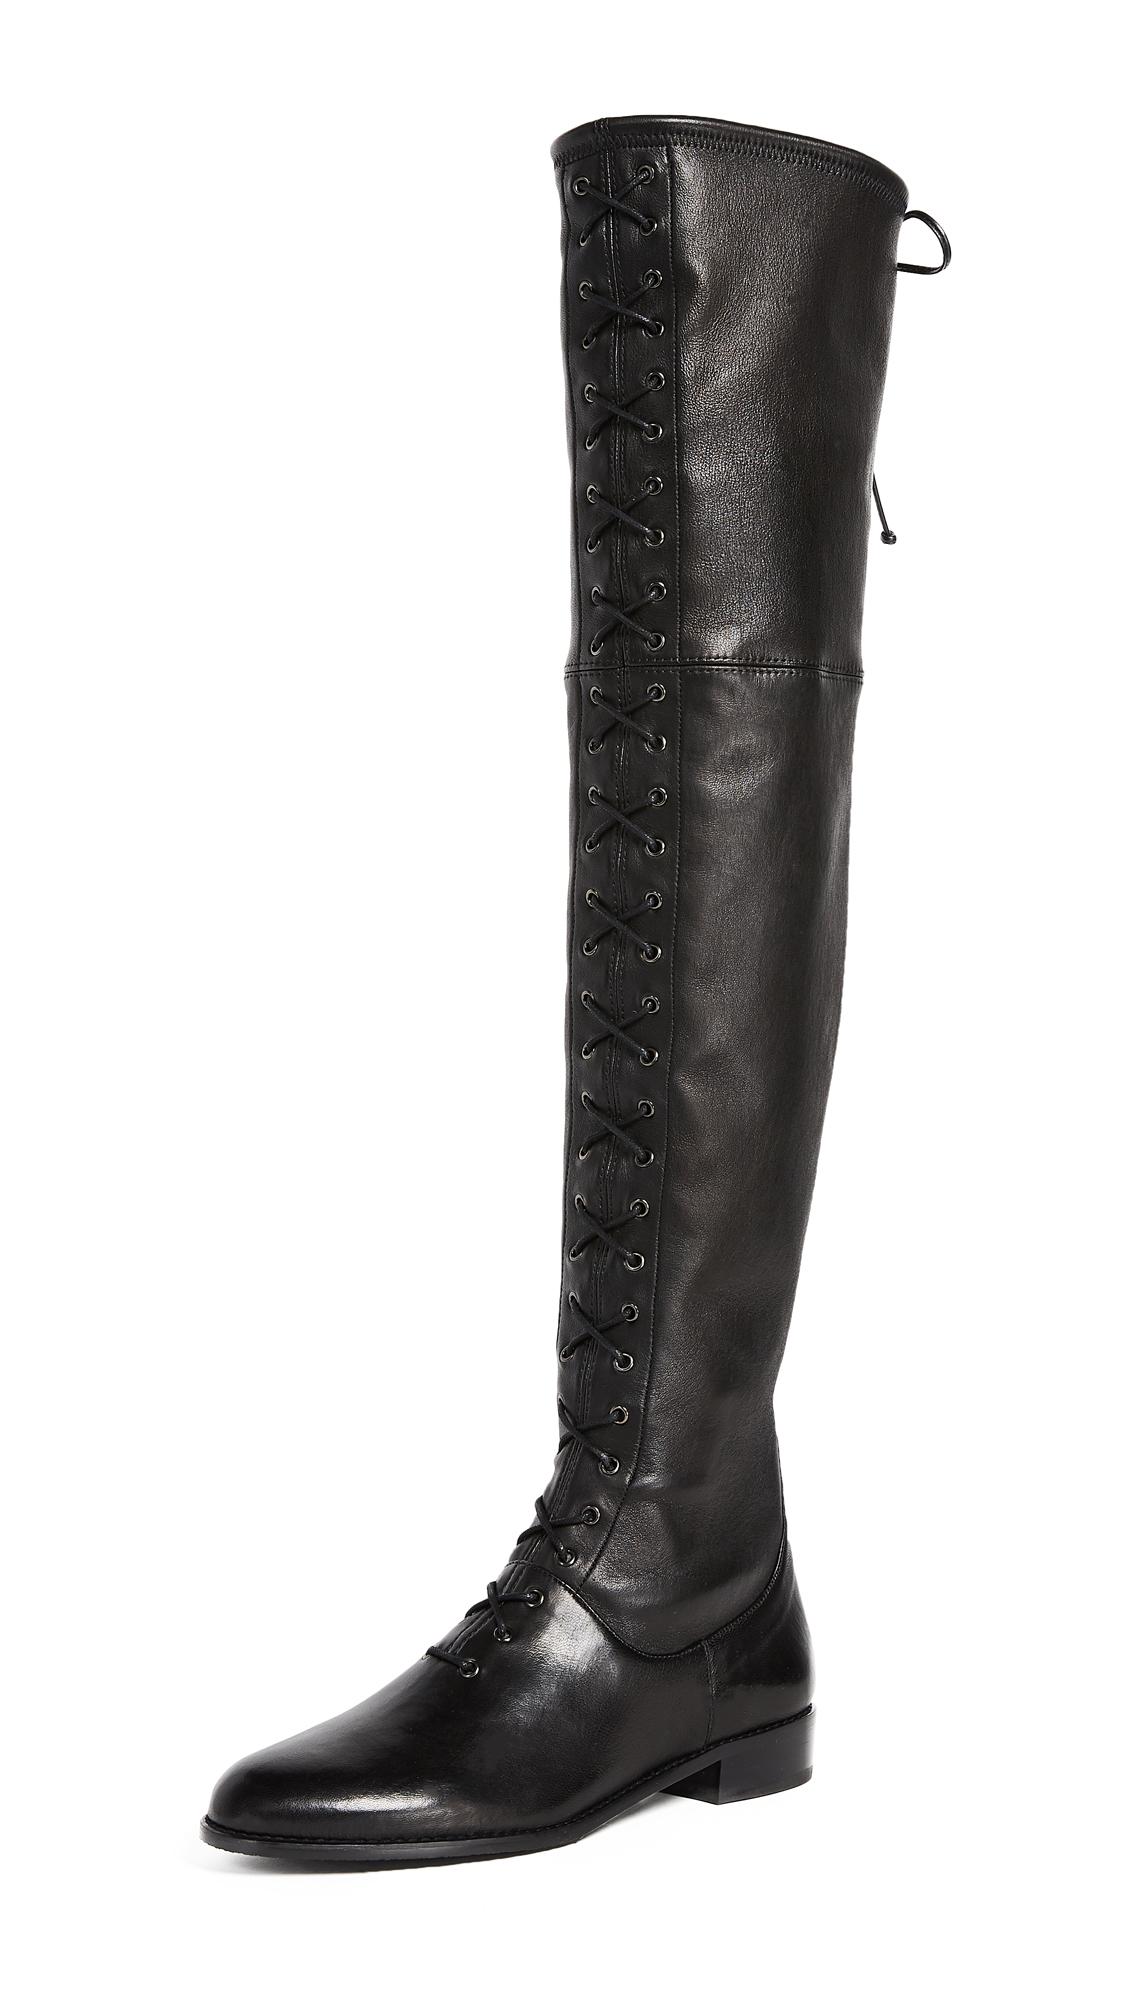 Stuart Weitzman Exes Knee High Boots - Nero